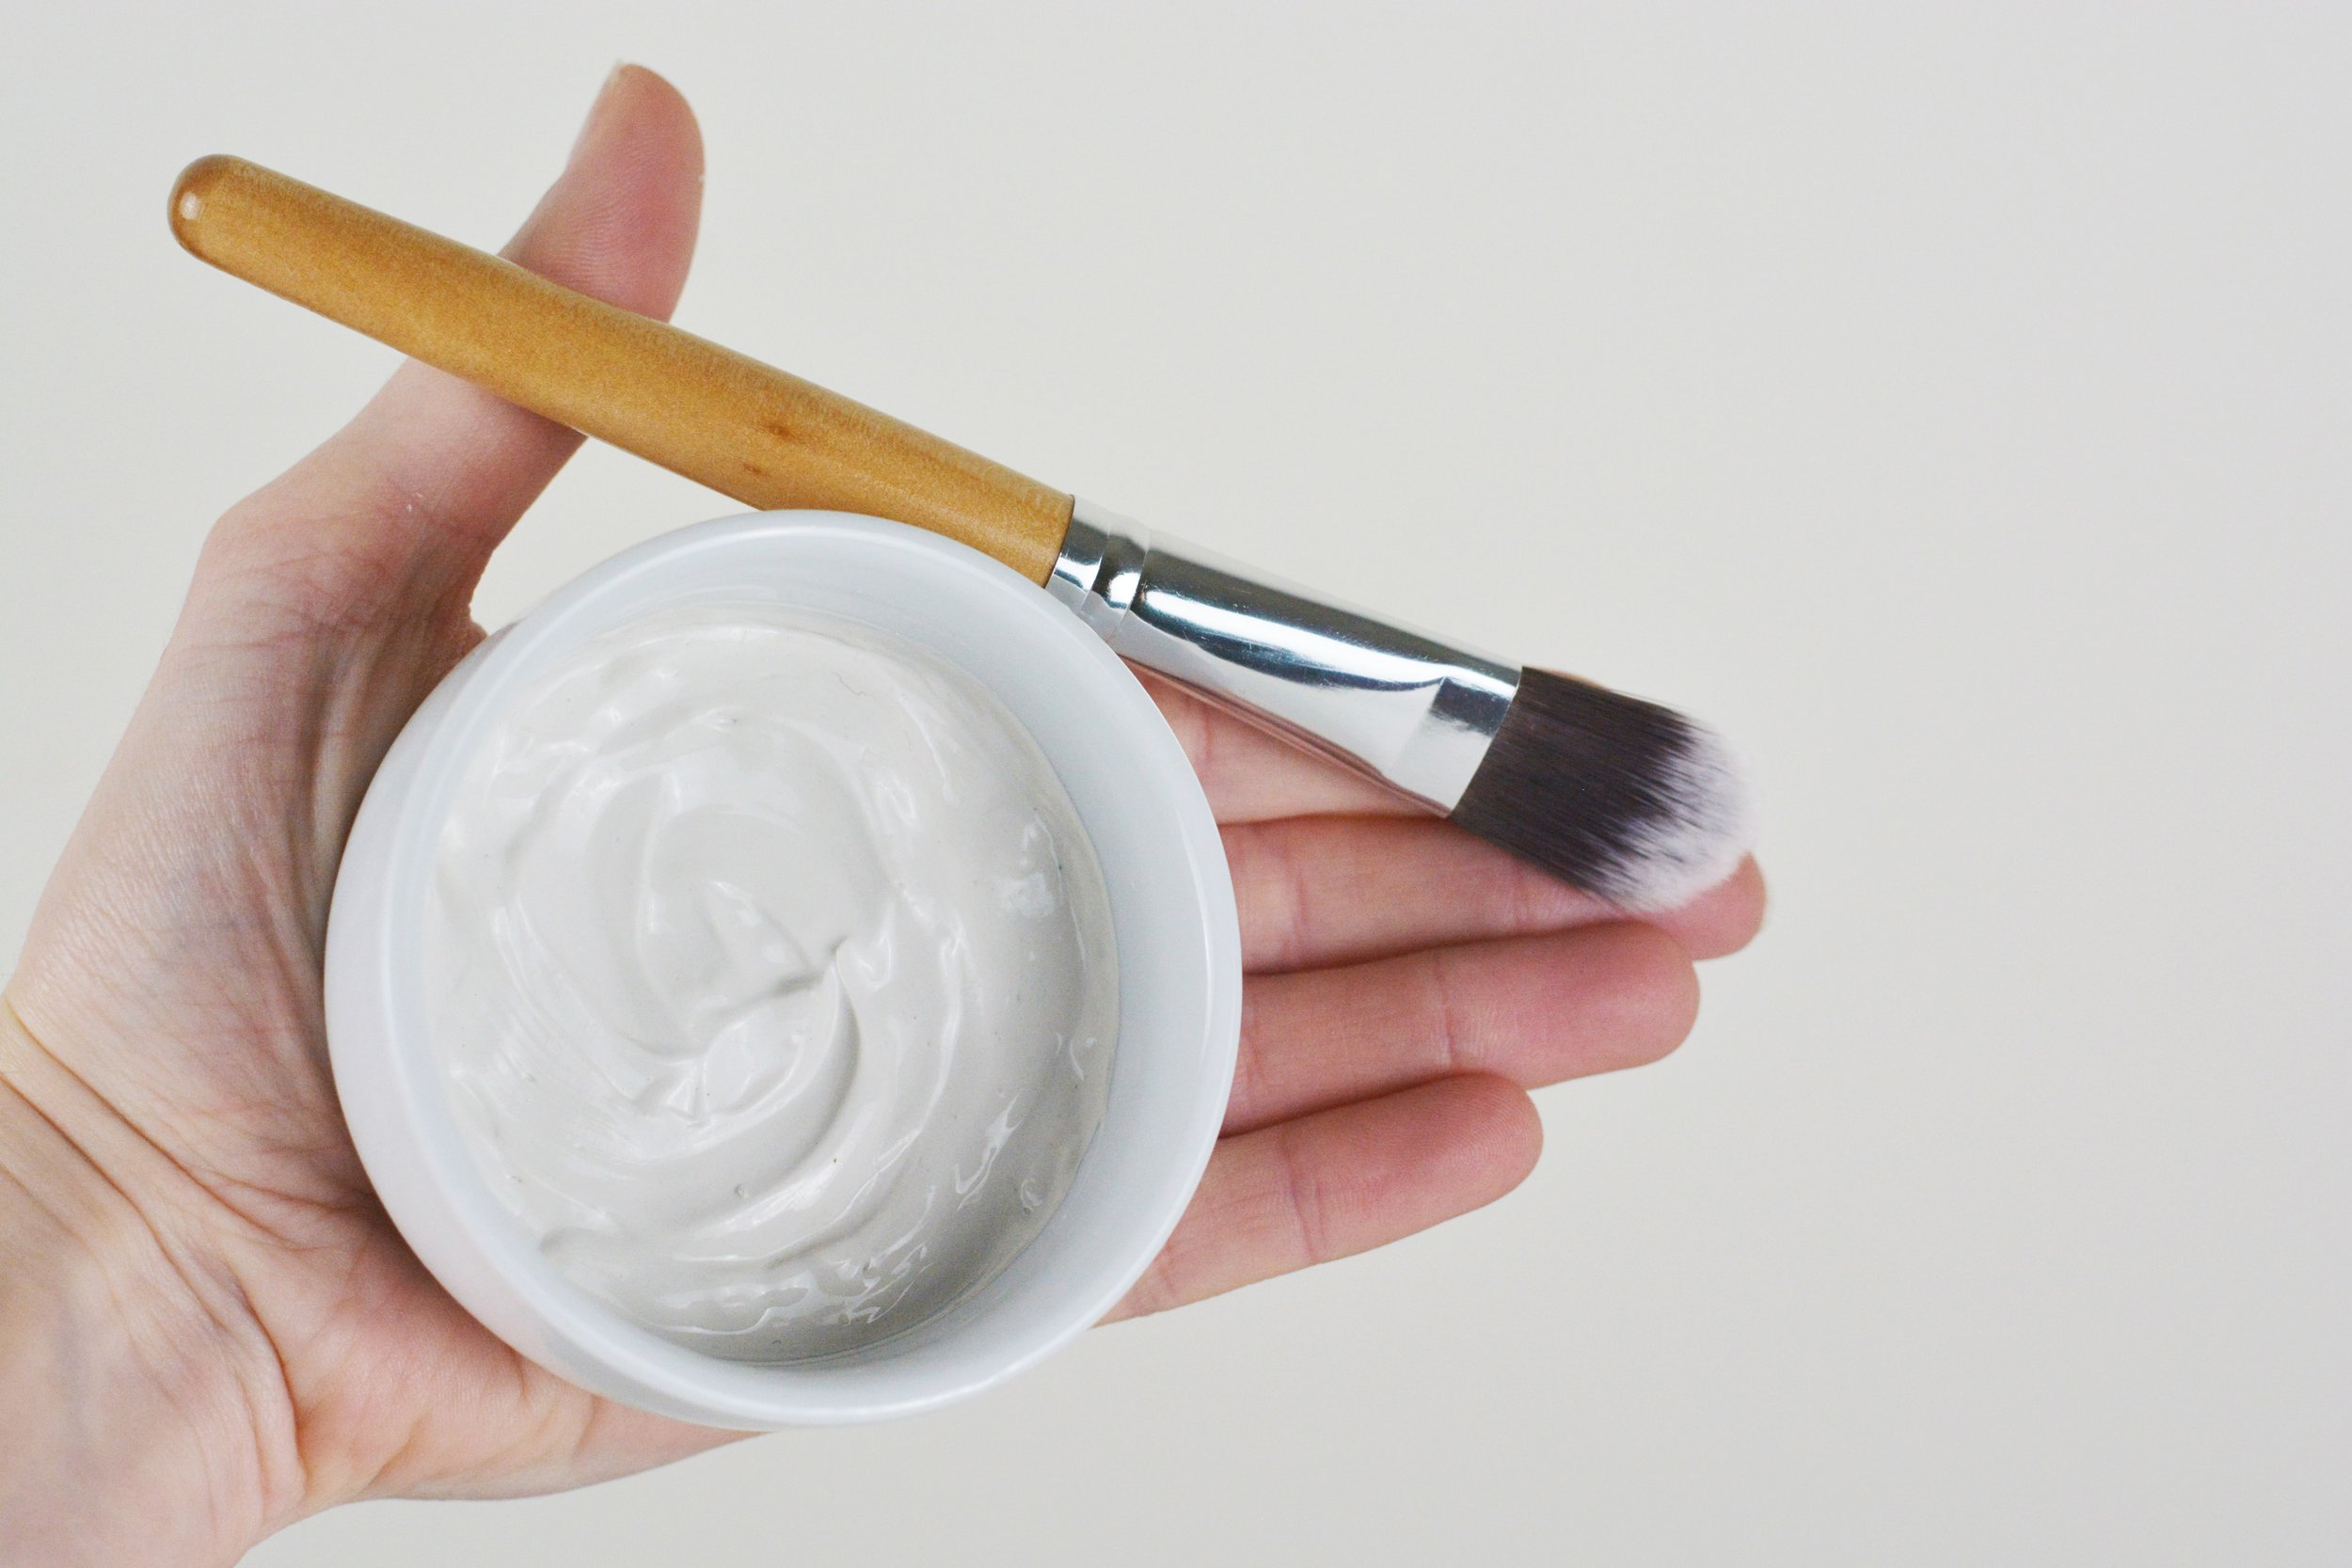 Australian Pure White Clay Facial Masks for Sensitive Skin